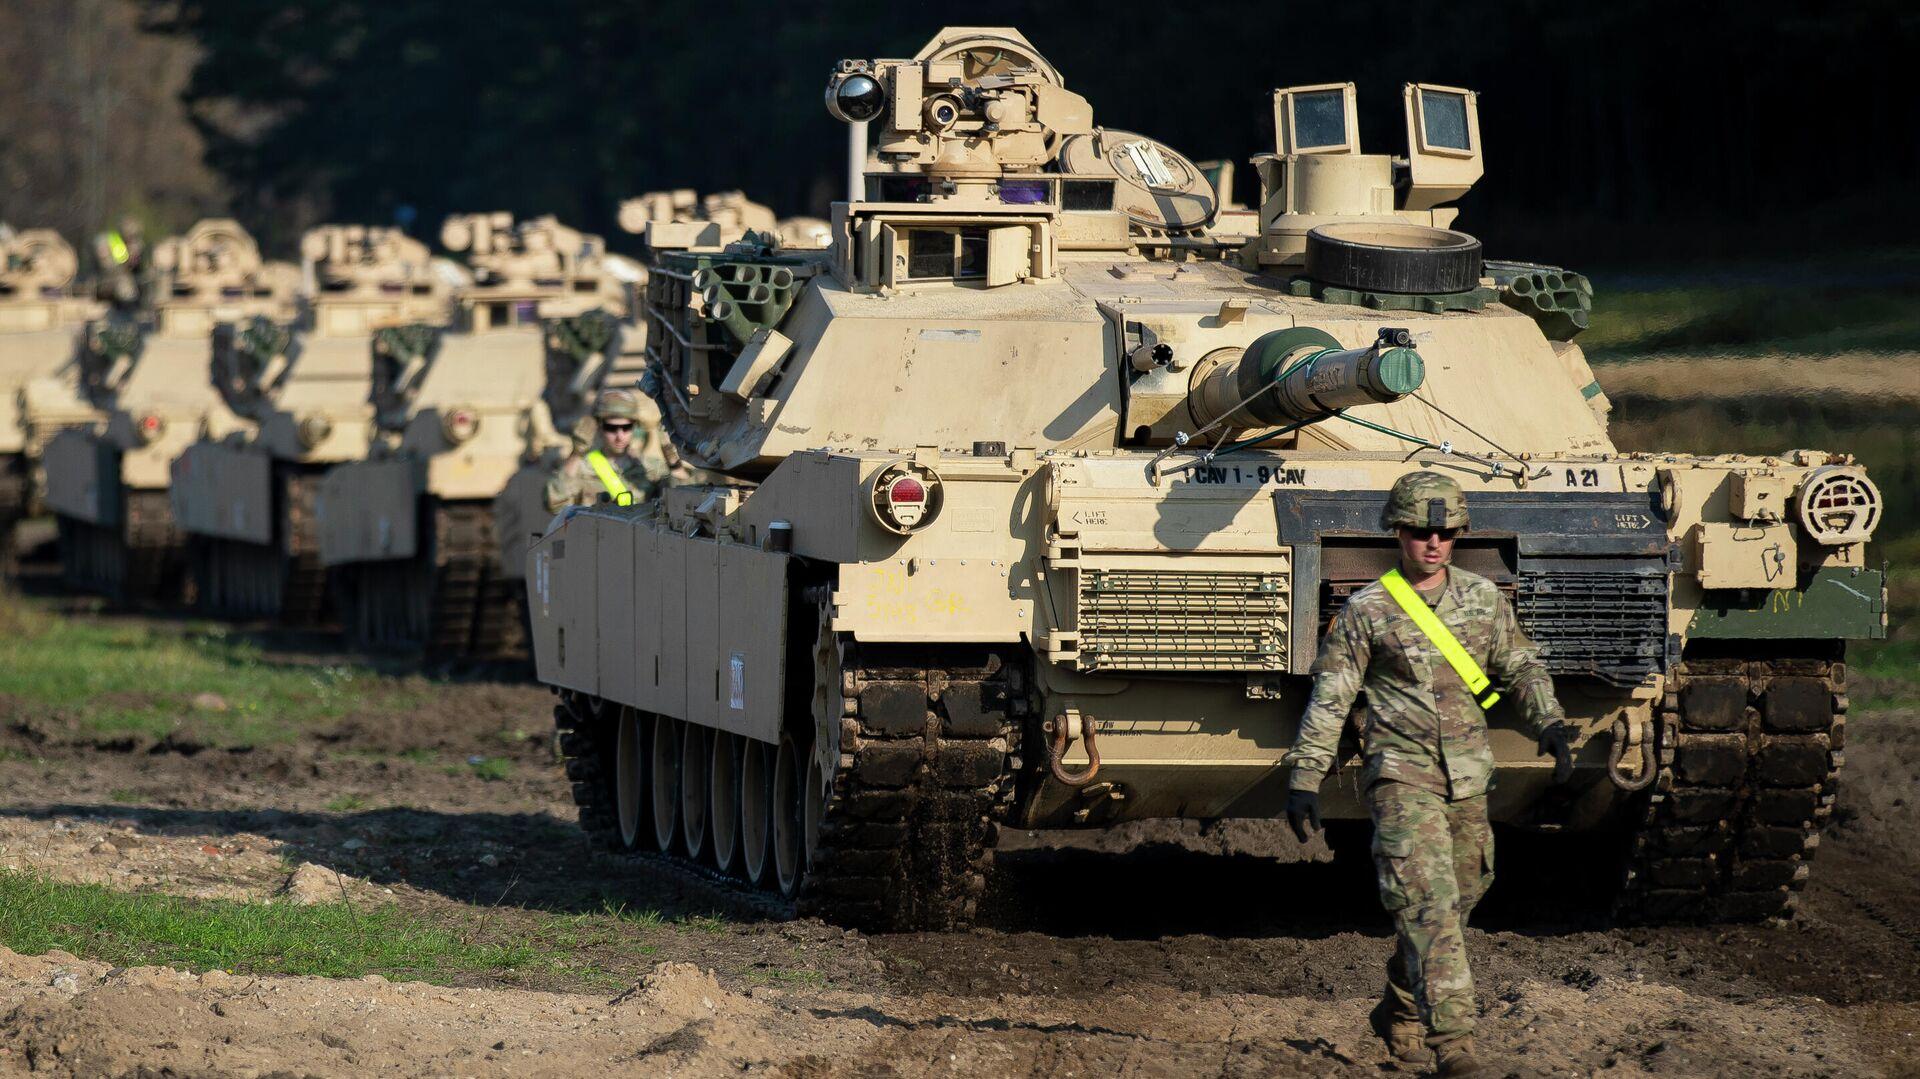 Американские танки Абрамс в городе Пабраде, Литва. 21 октября 2019 - РИА Новости, 1920, 09.07.2020